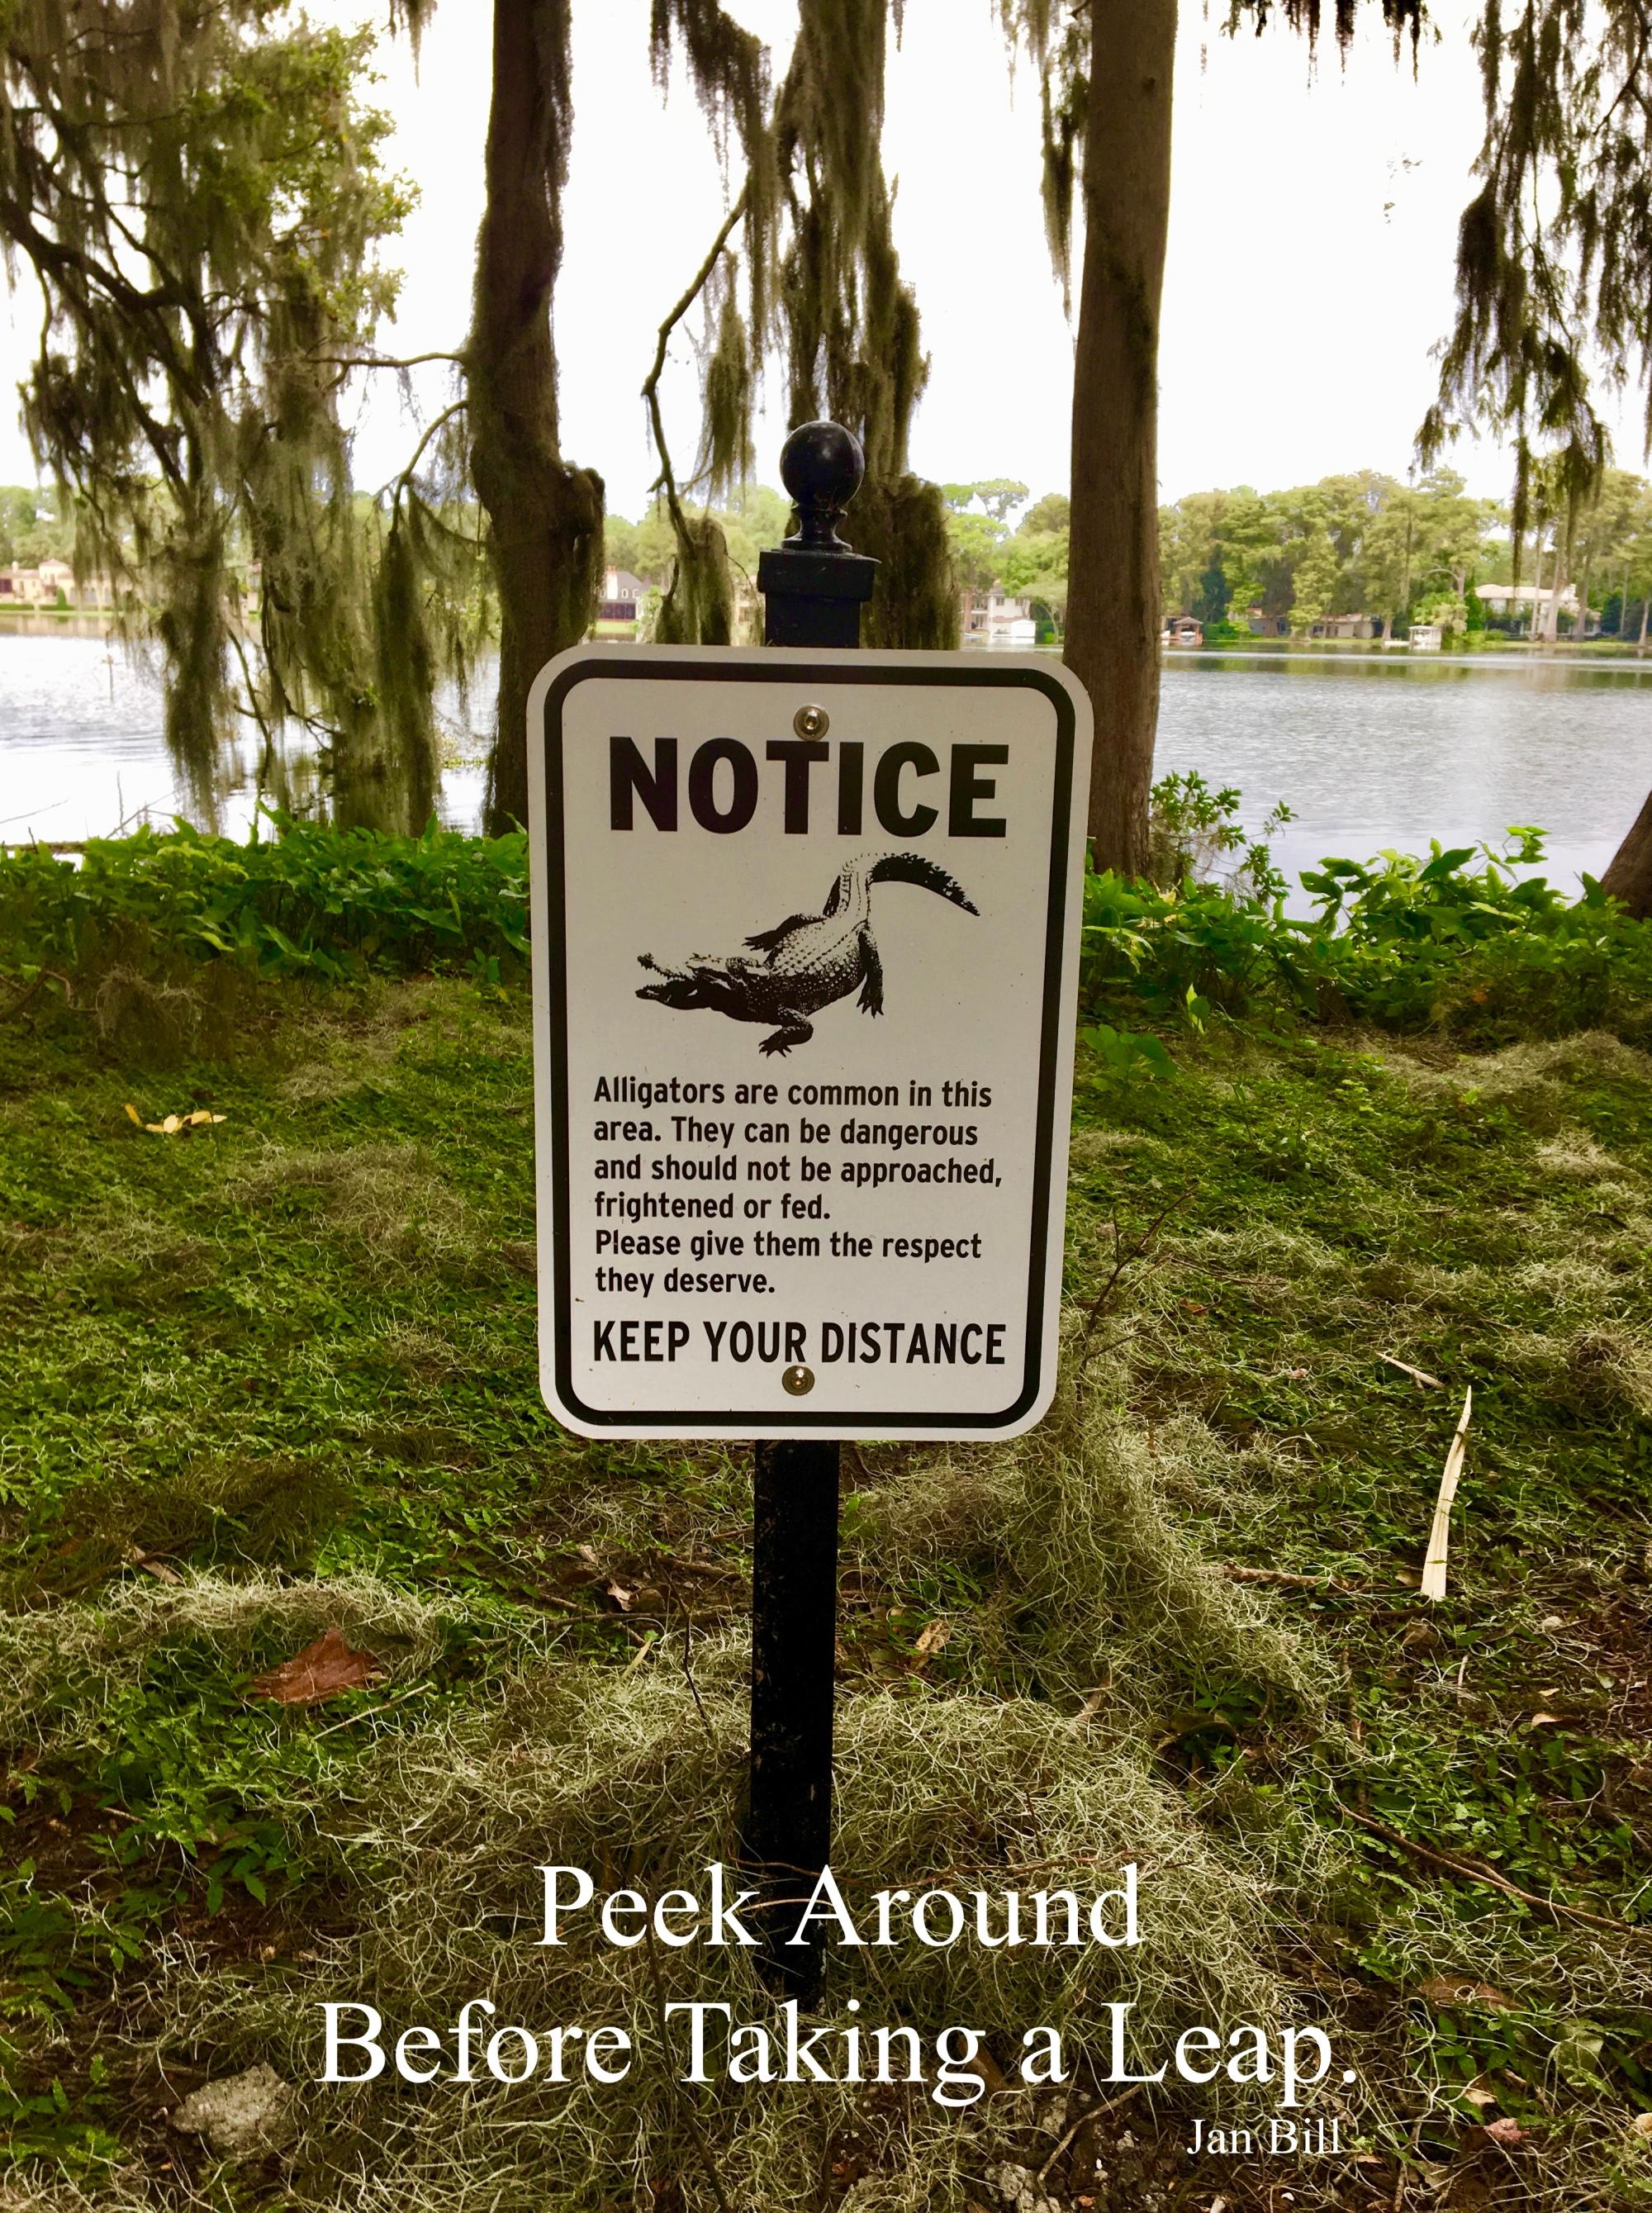 image of sign warning about alligators